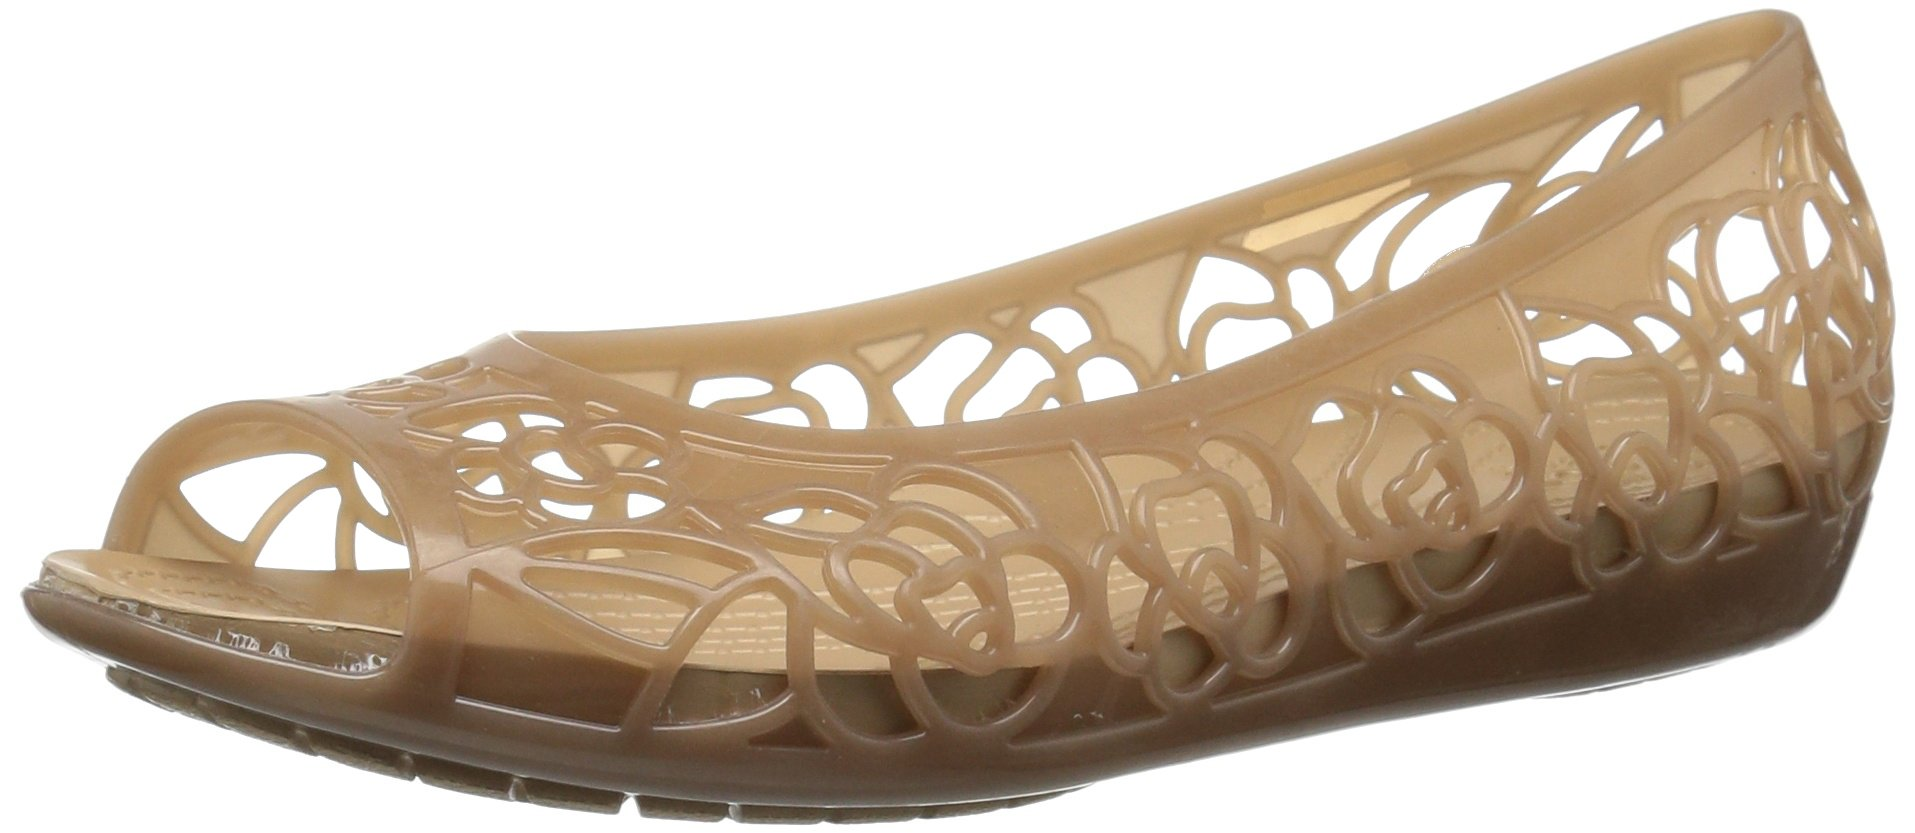 Crocs Women's Isabella Jelly Flat W Ballet, Bronze/Gold, 7 M US